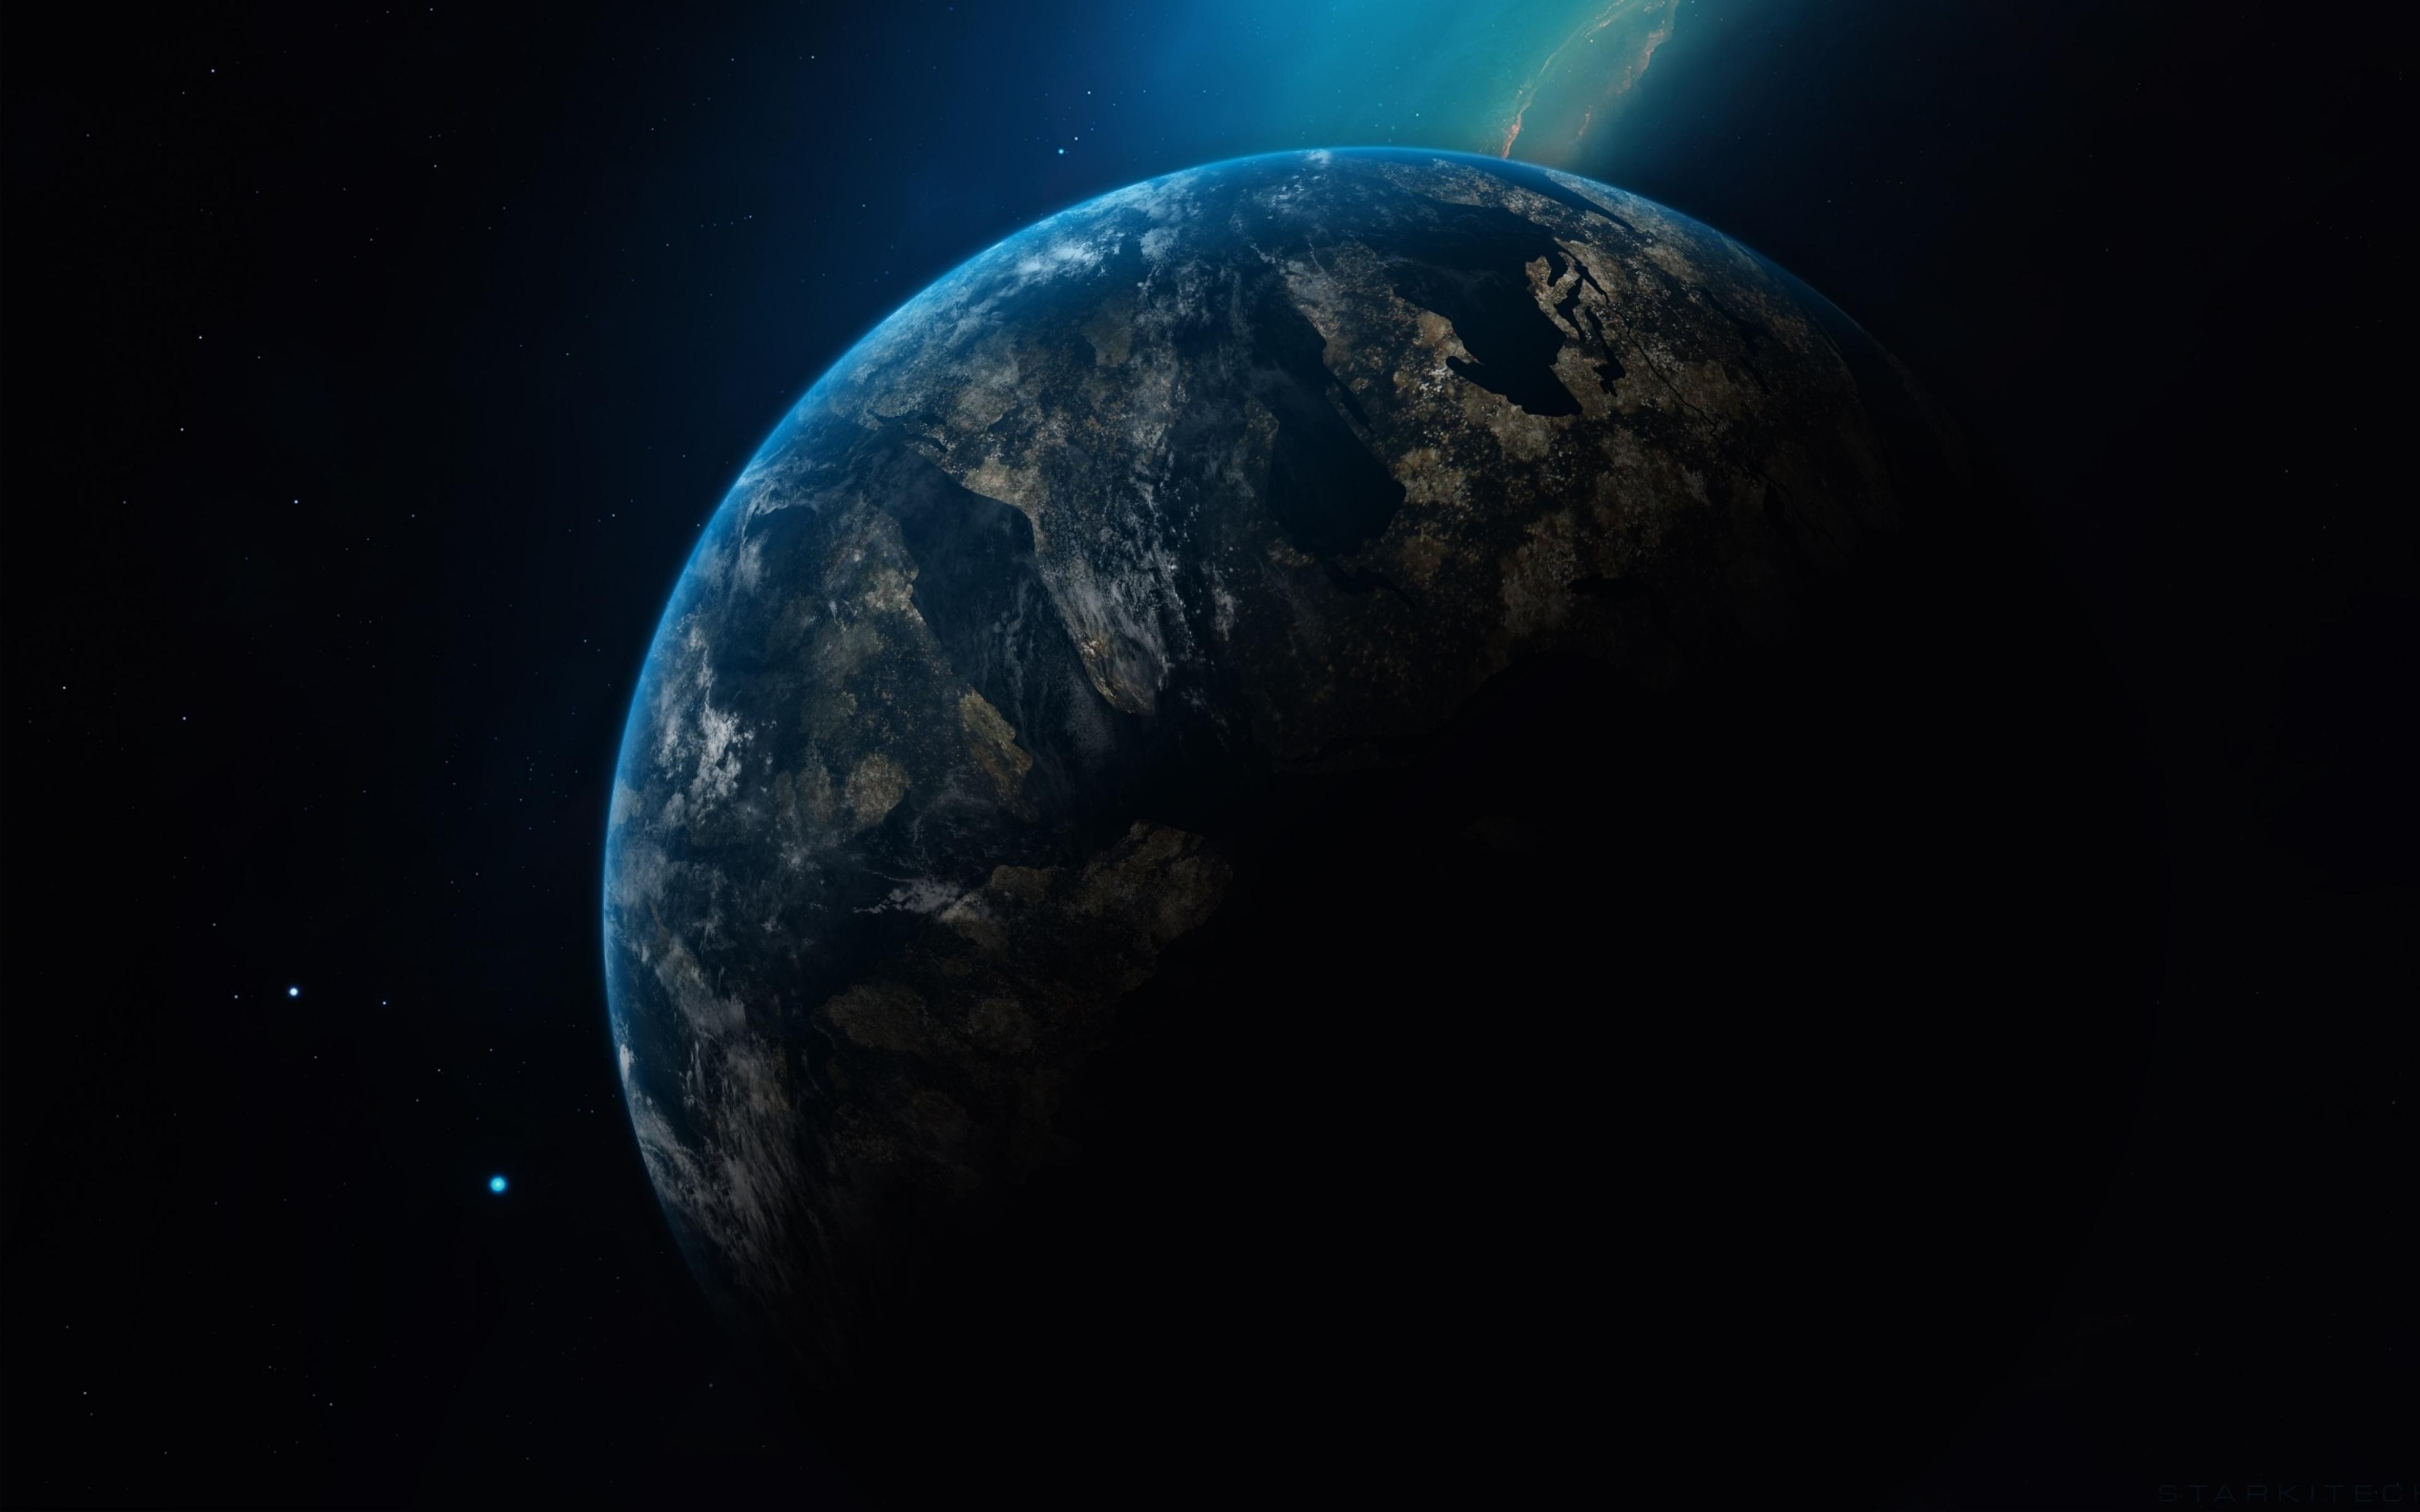 3840x2400 Planet Earth in Dark Universe UHD 4K 3840x2400 ...